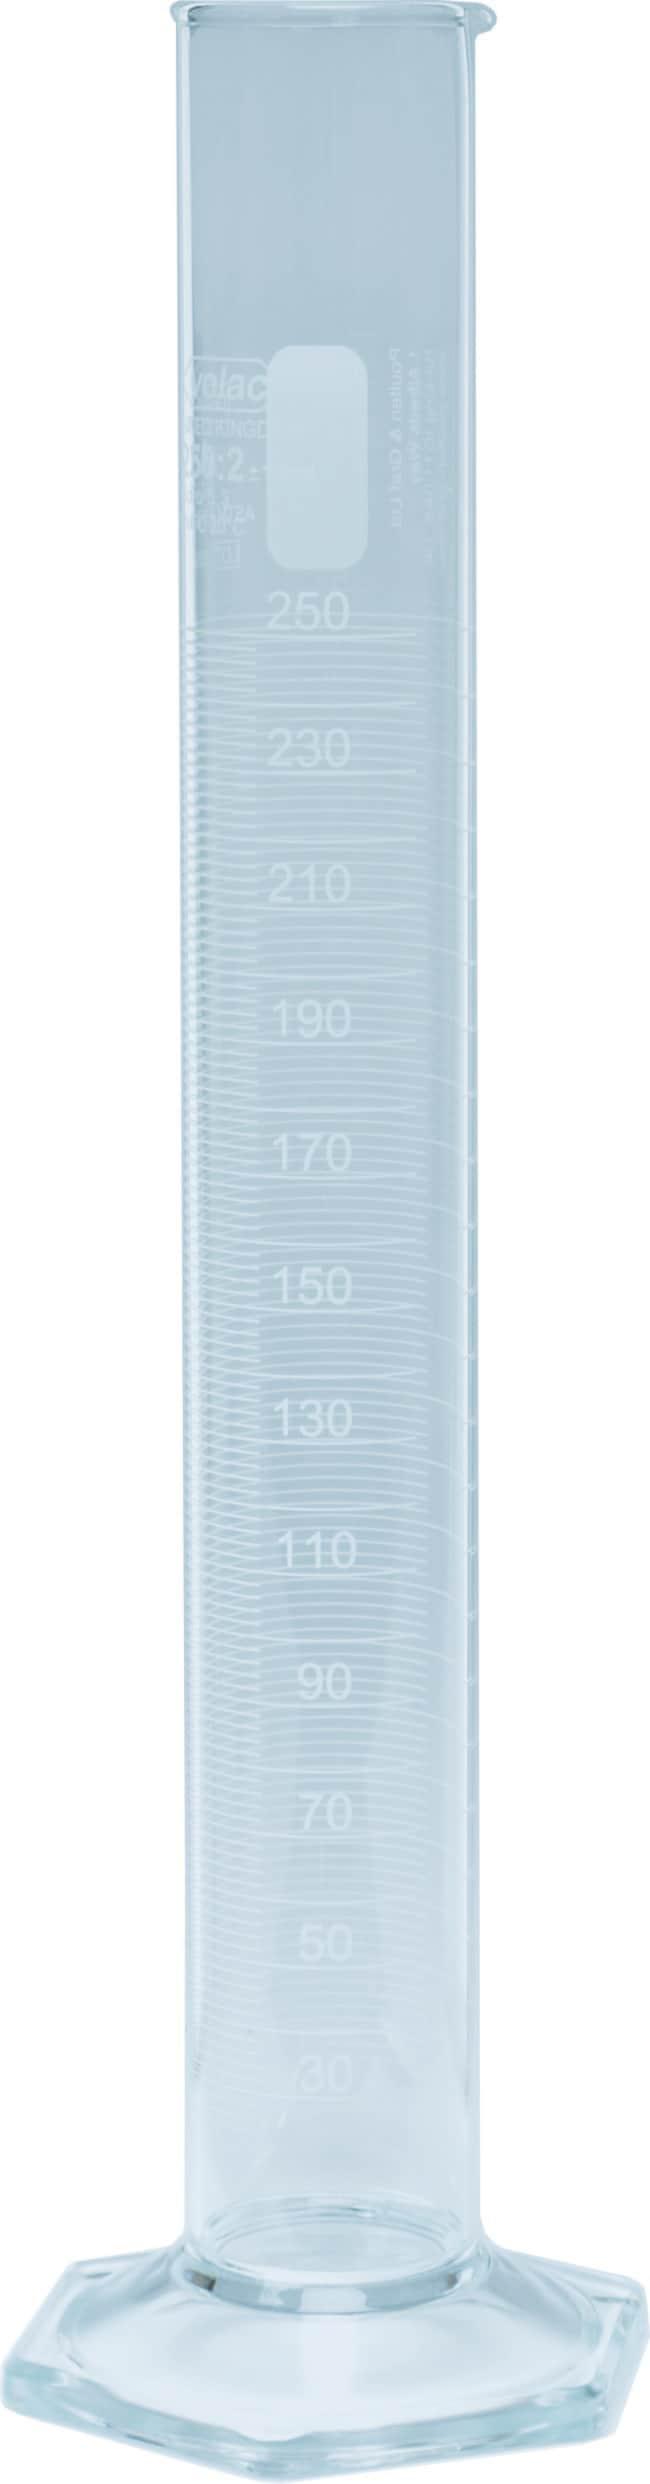 Poulten Graf™Volac™ Class A Borosilicate Glass Graduated Cylinders Capacity: 250mL Poulten Graf™Volac™ Class A Borosilicate Glass Graduated Cylinders